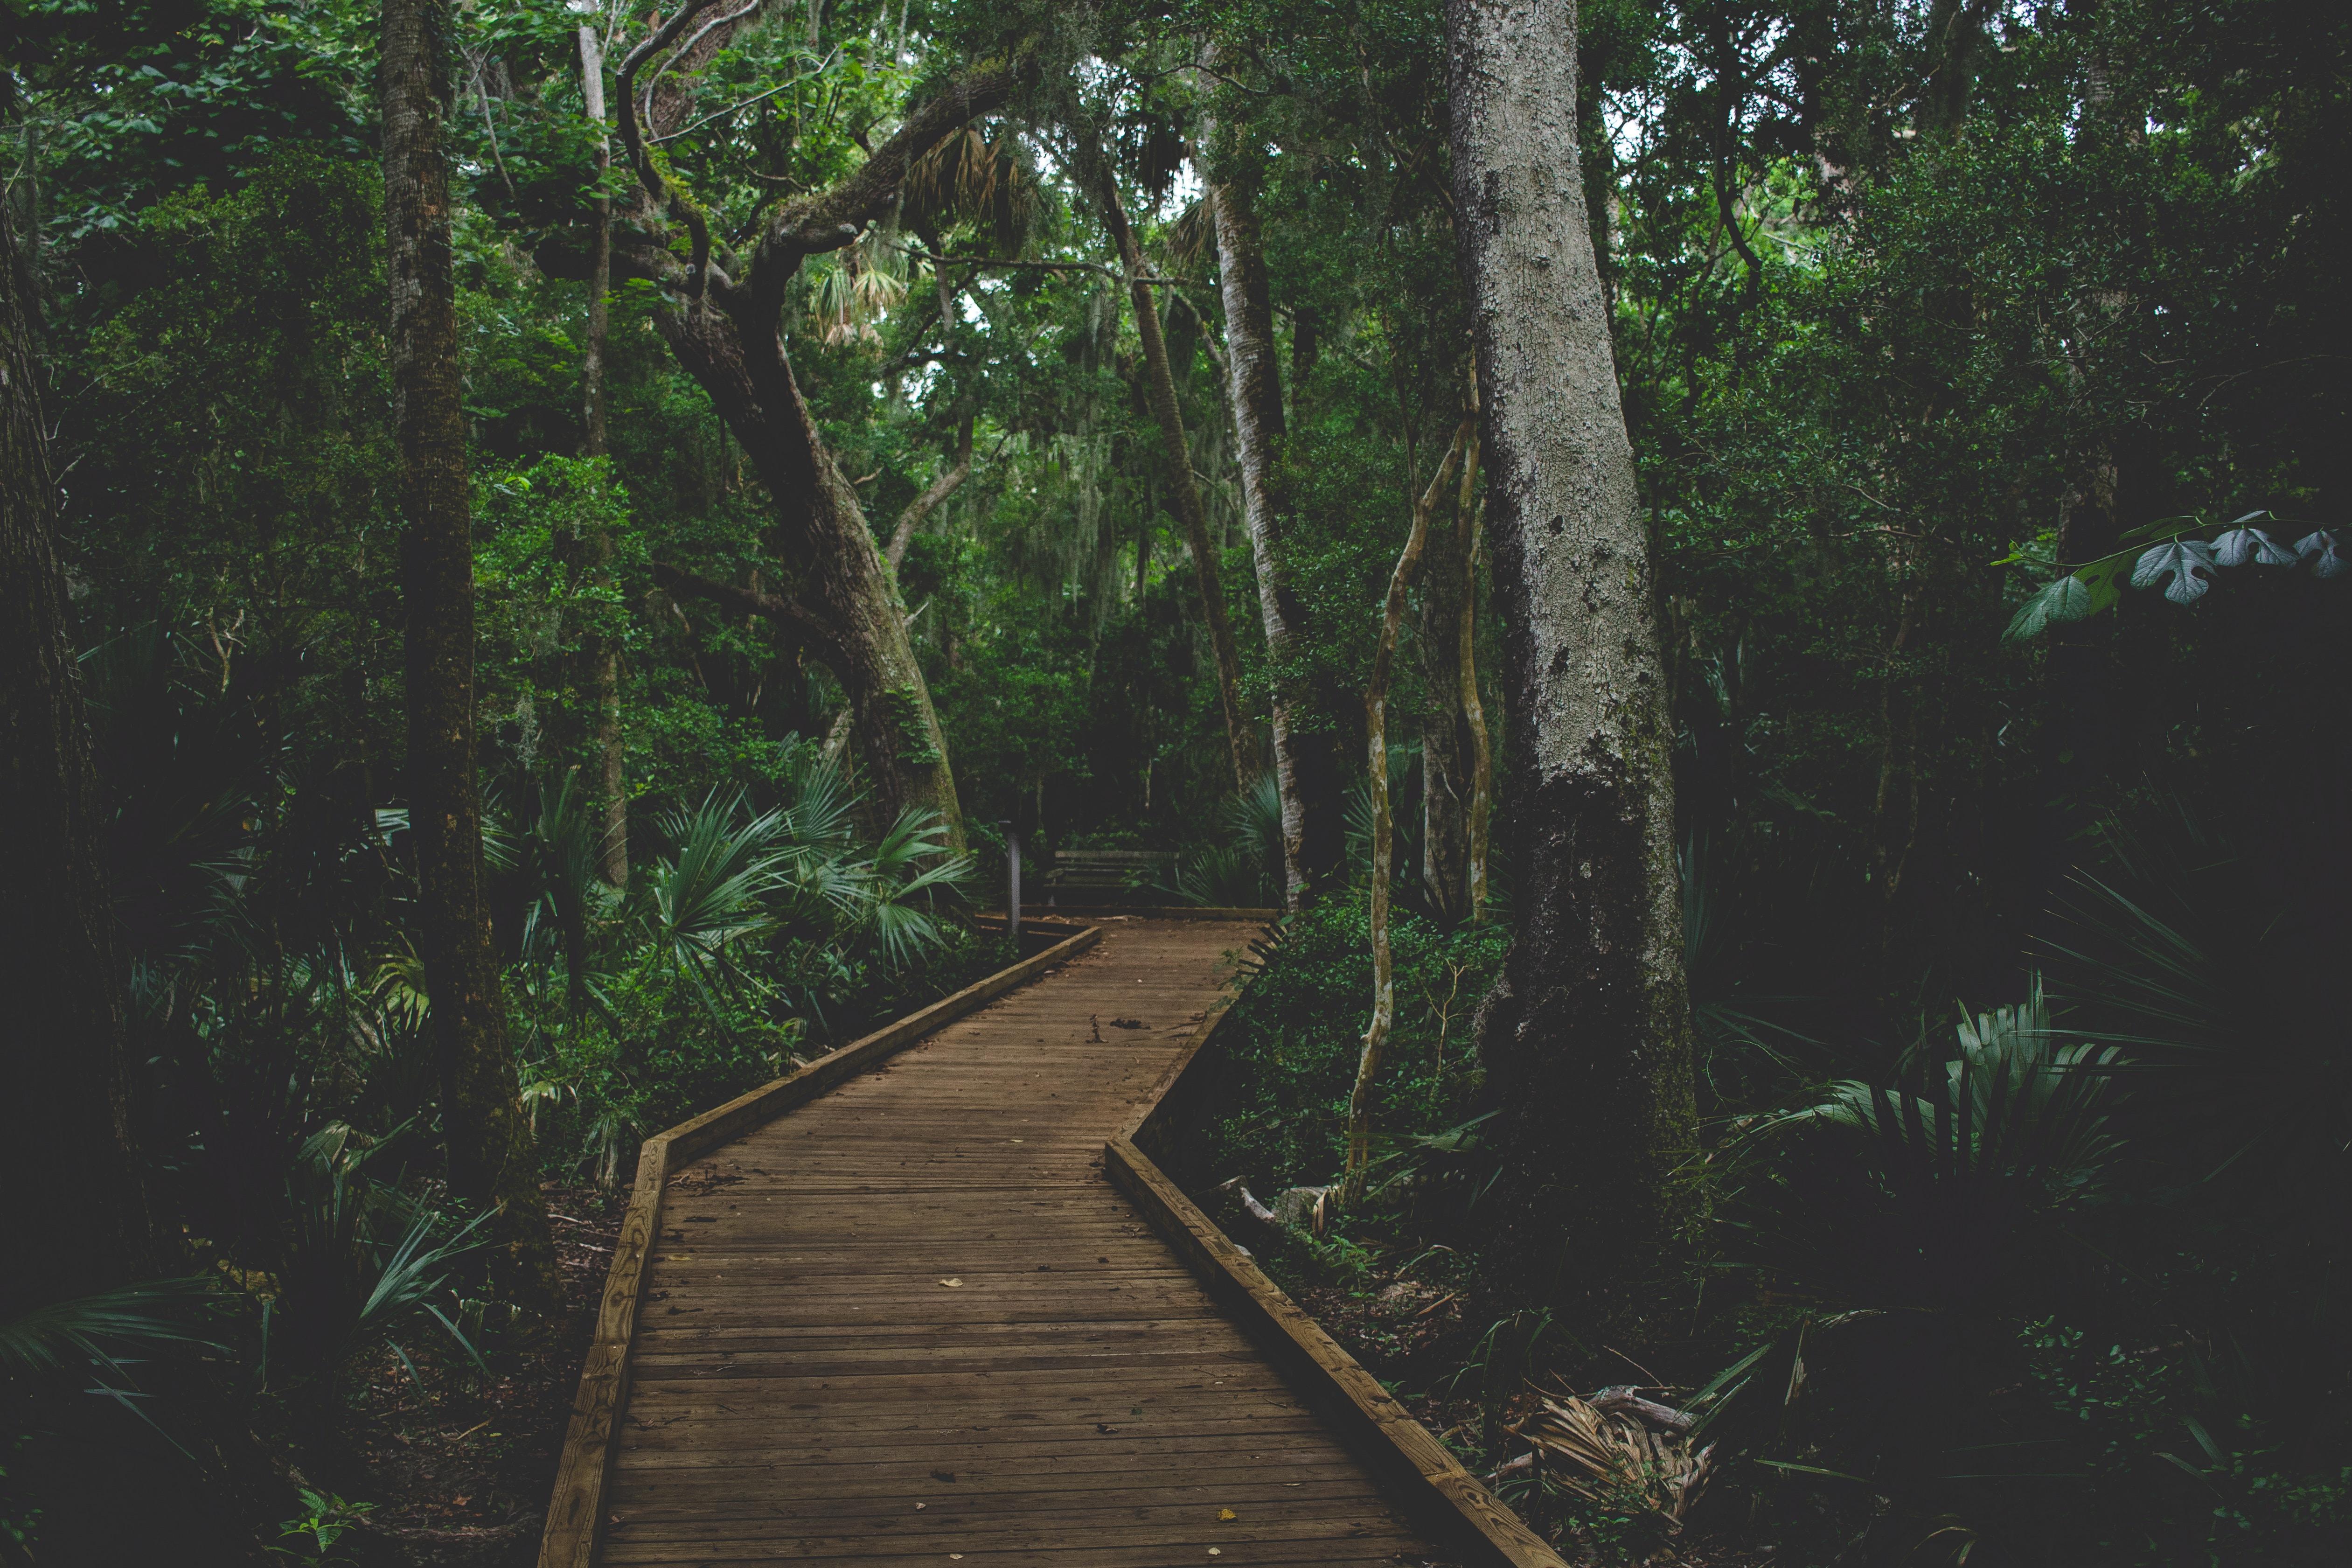 brown wooden path between trees